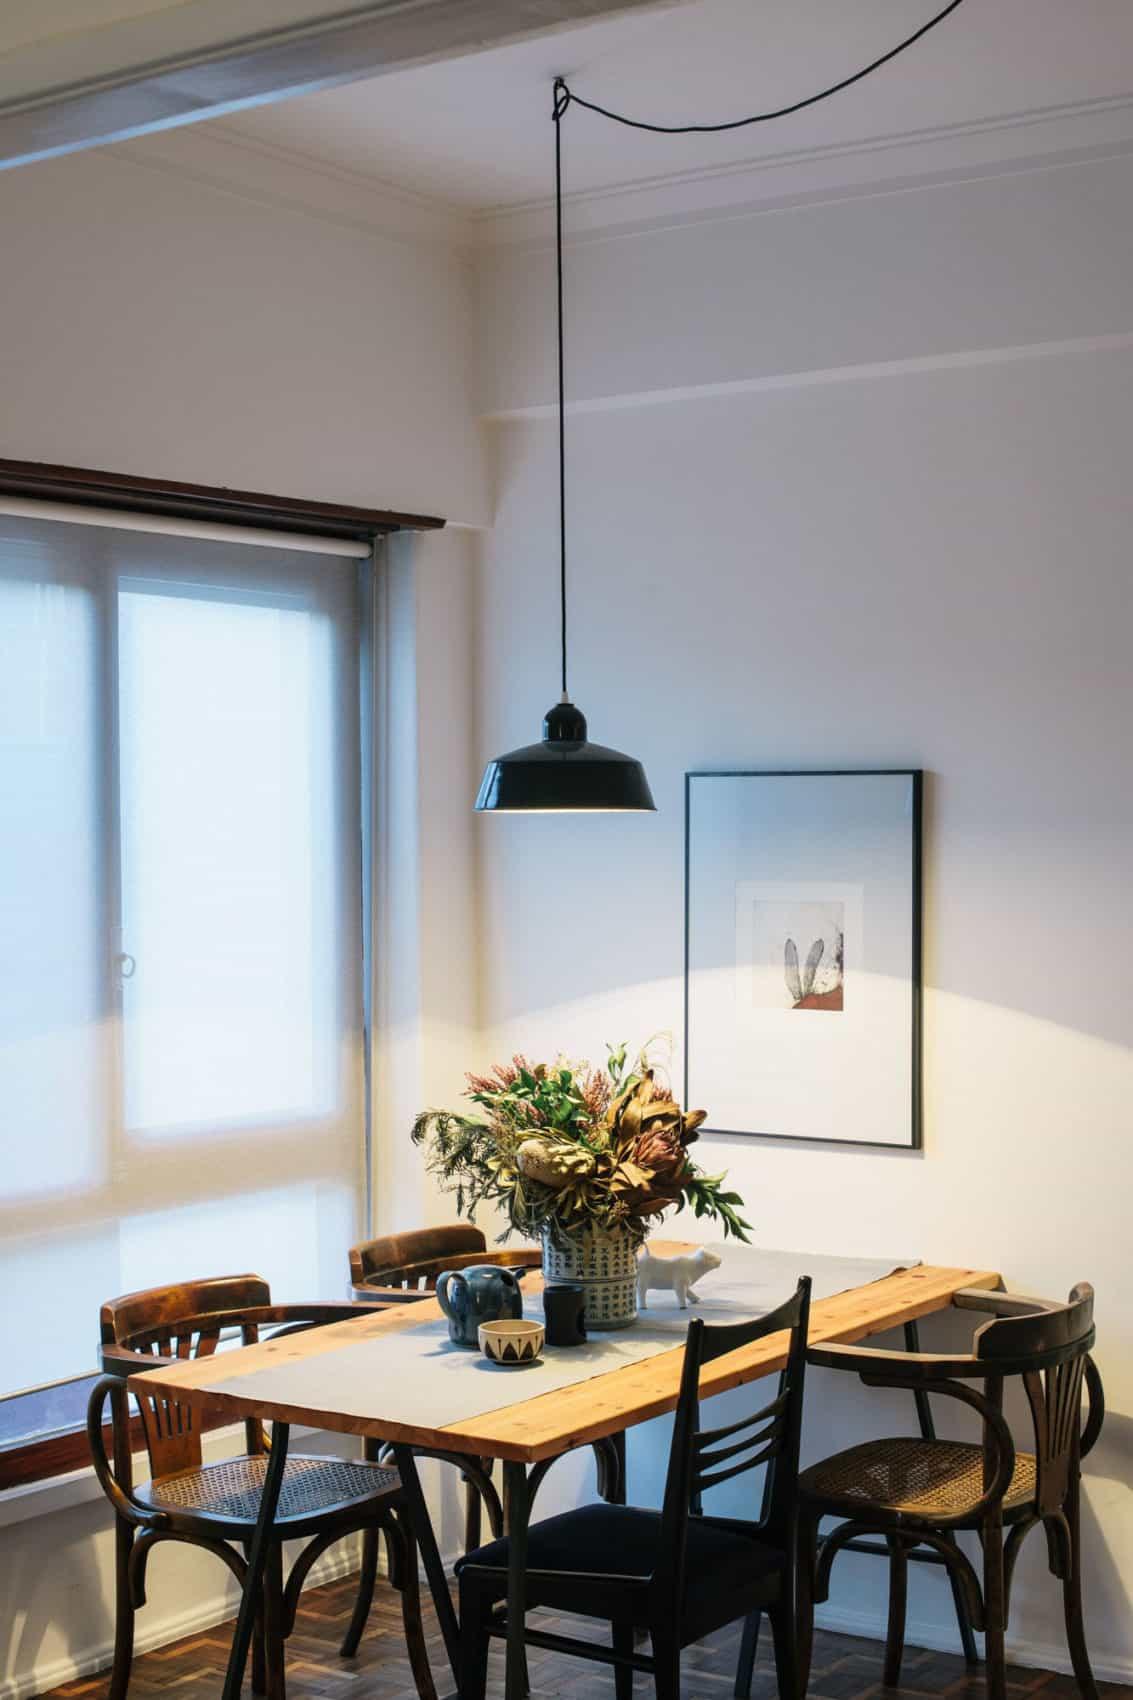 Apartment in Lisbon by Ark.studio (7)